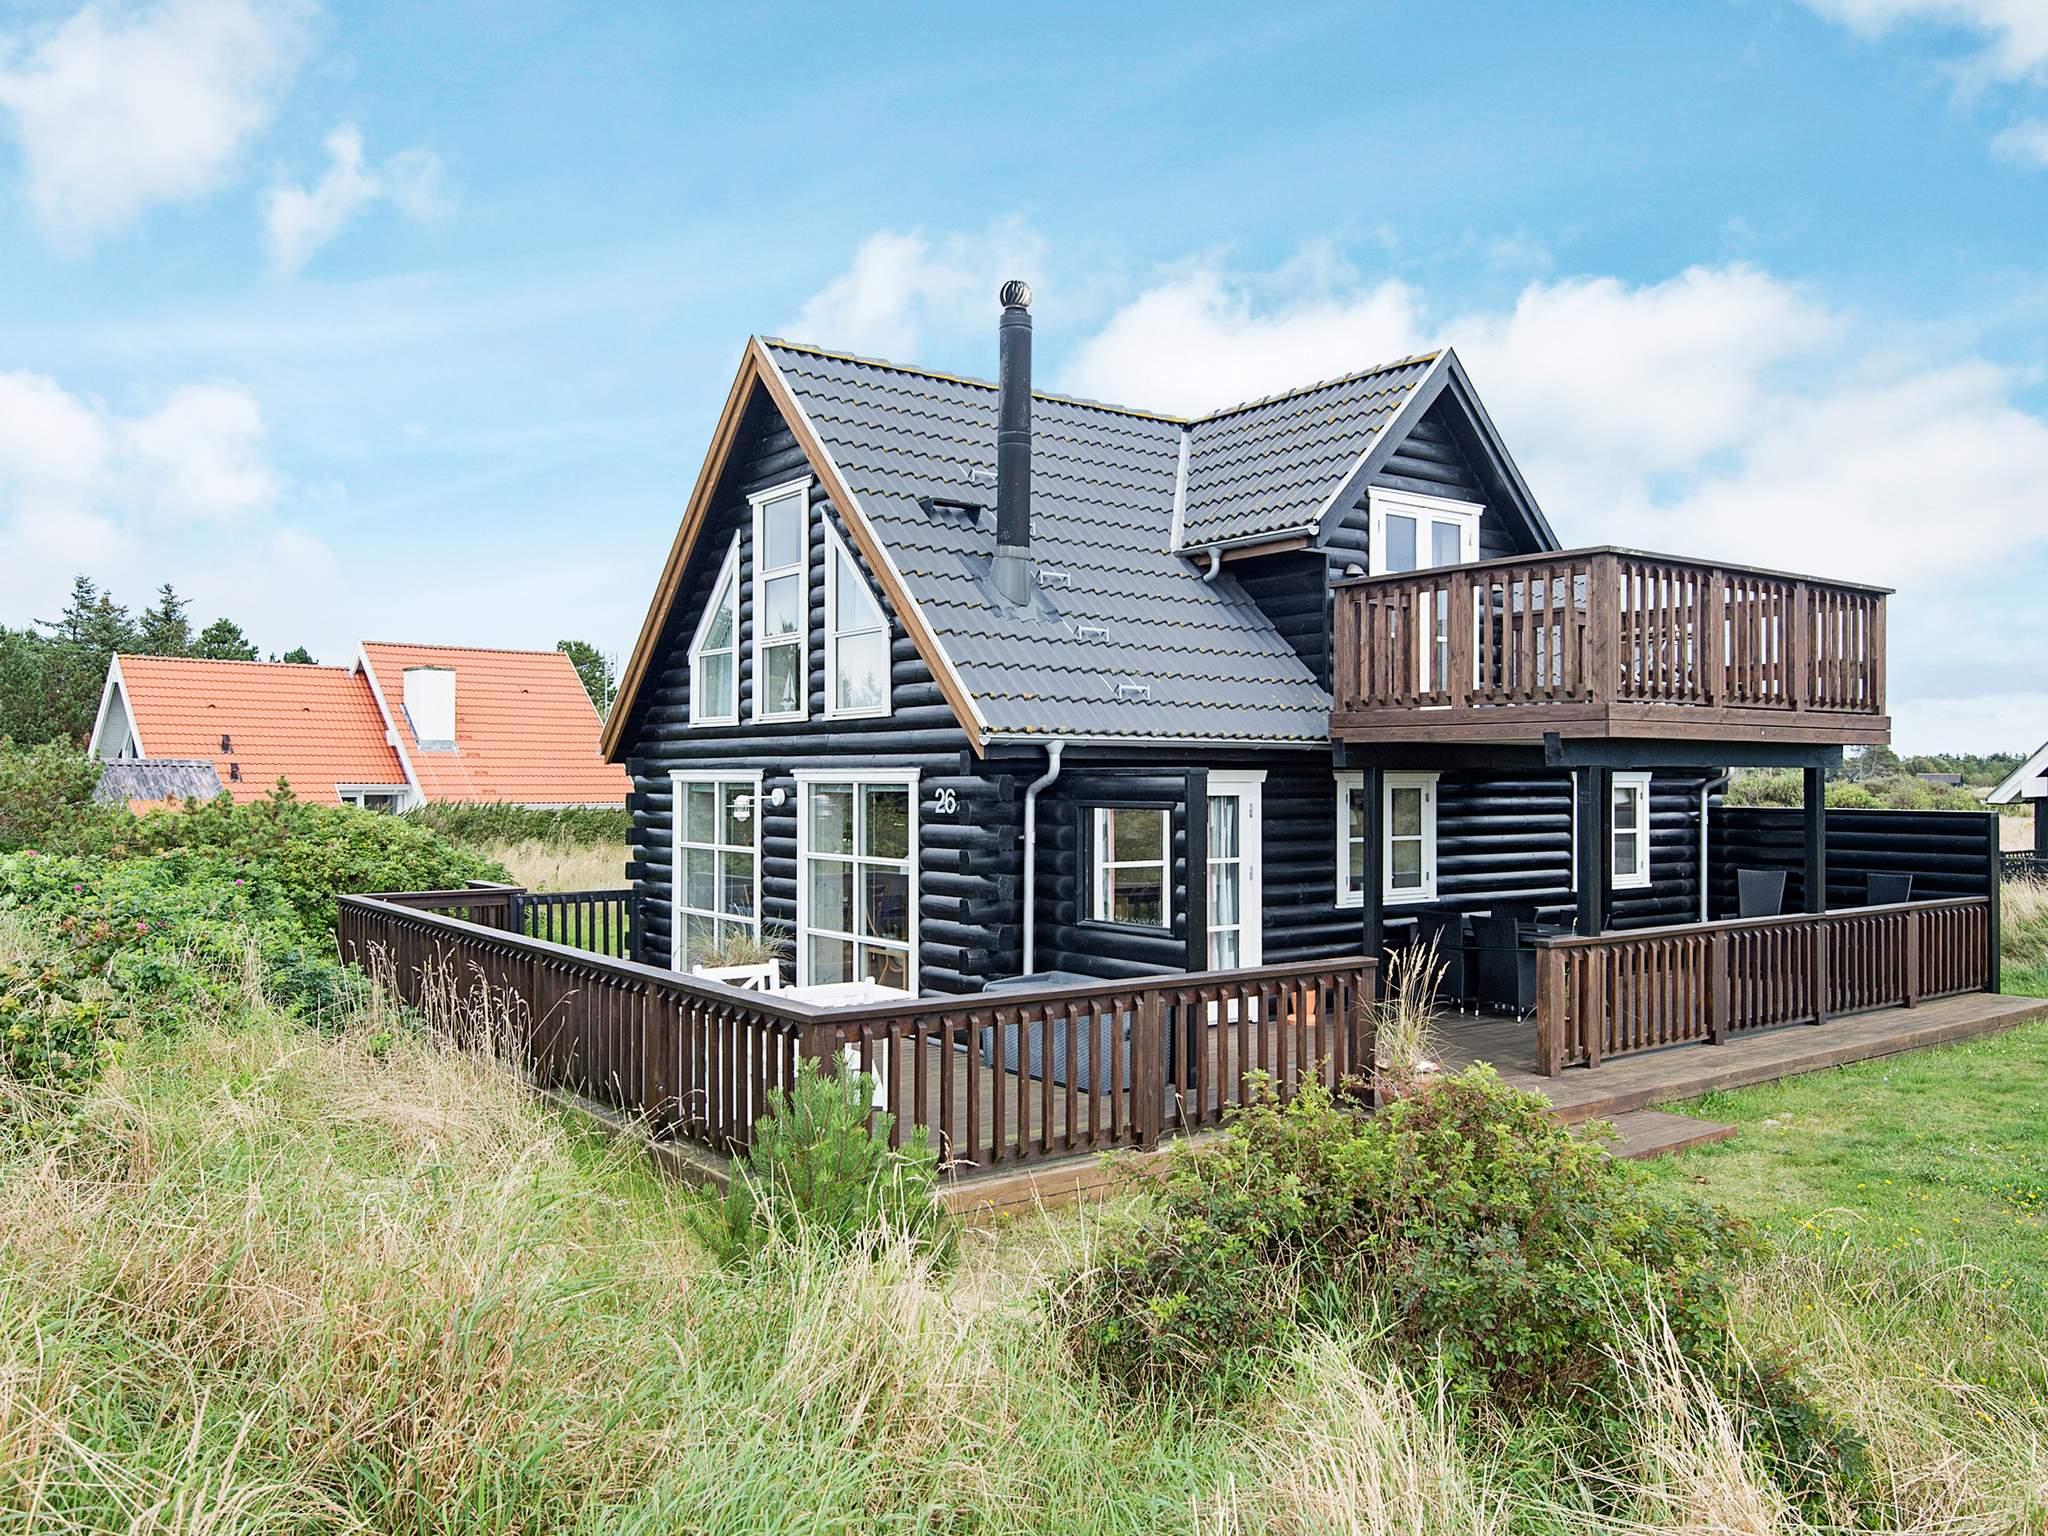 Ferienhaus Kandestederne (187101), Kandestederne, , Nordostjütland, Dänemark, Bild 1